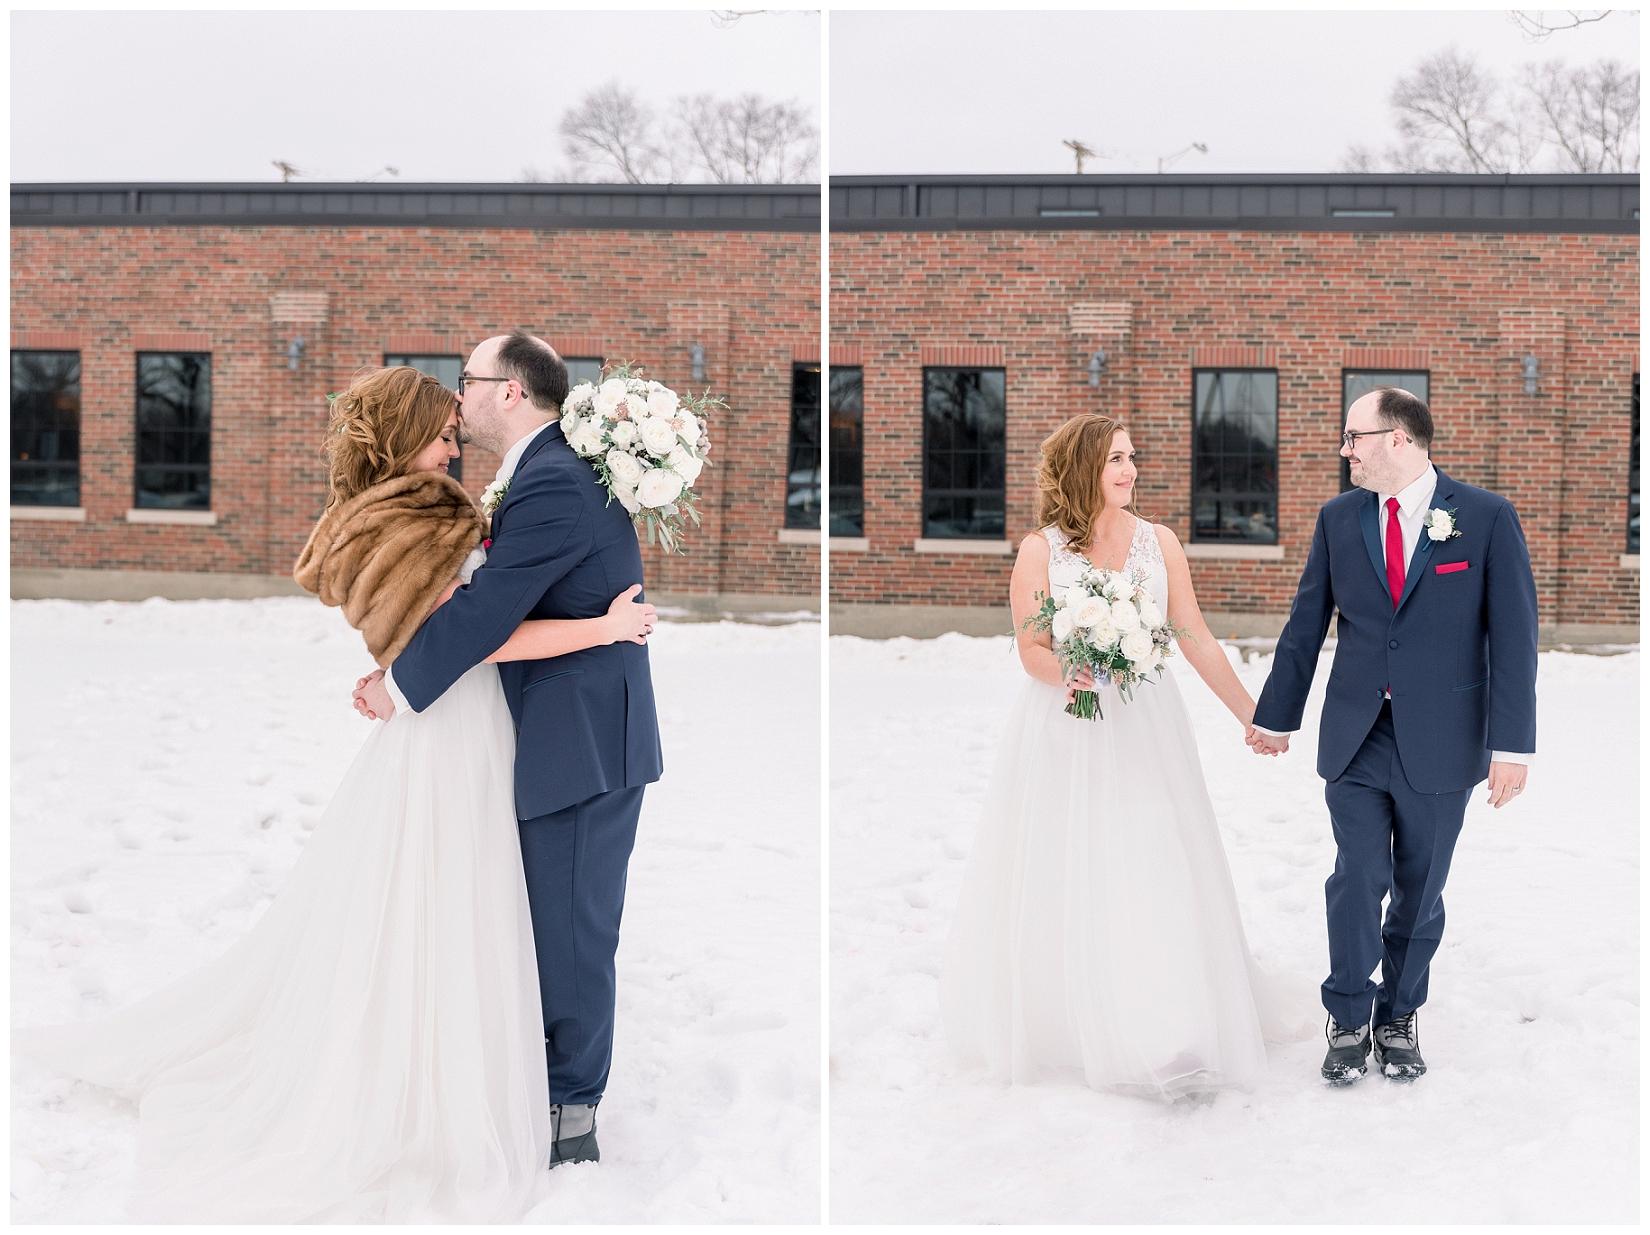 cat-alkire-wedding-photographer-indiana-chicago-indianapolis-fort-wayne_0972.jpg